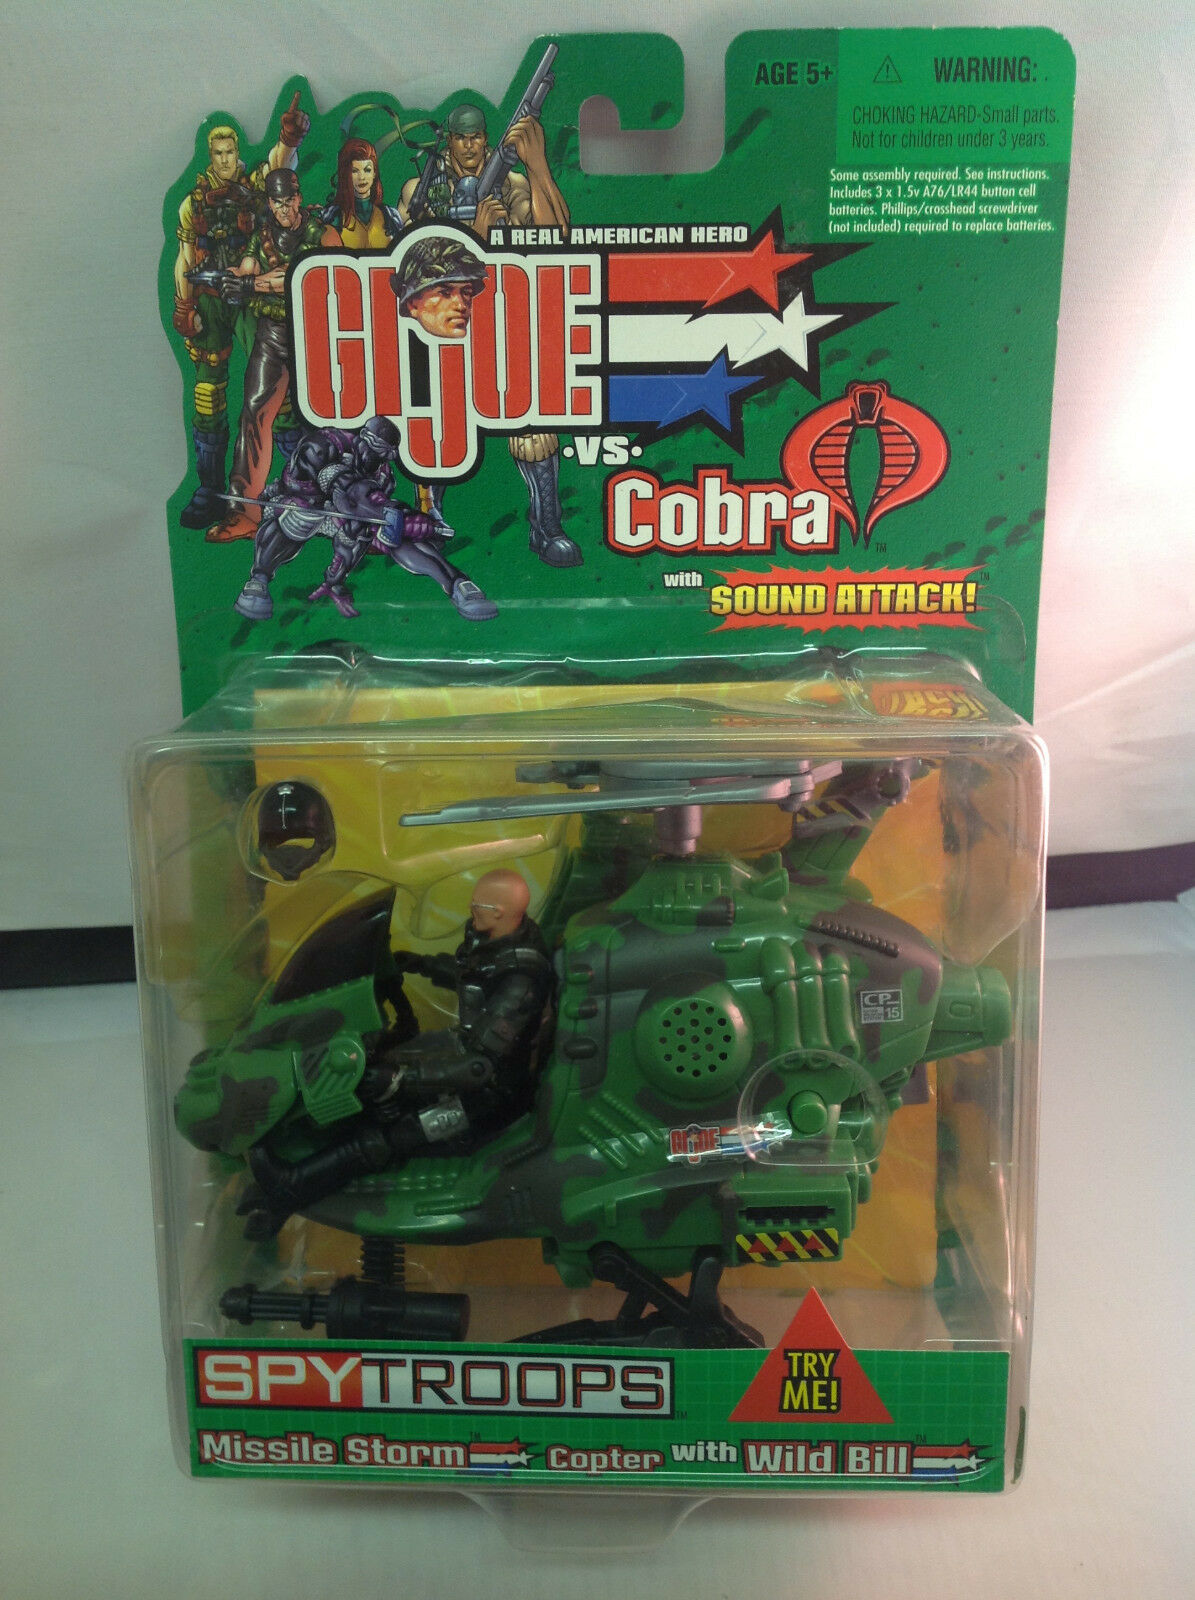 New GI Joe Vs Cobra Spytroops Missile Storm Copter with Wild Bill MOC